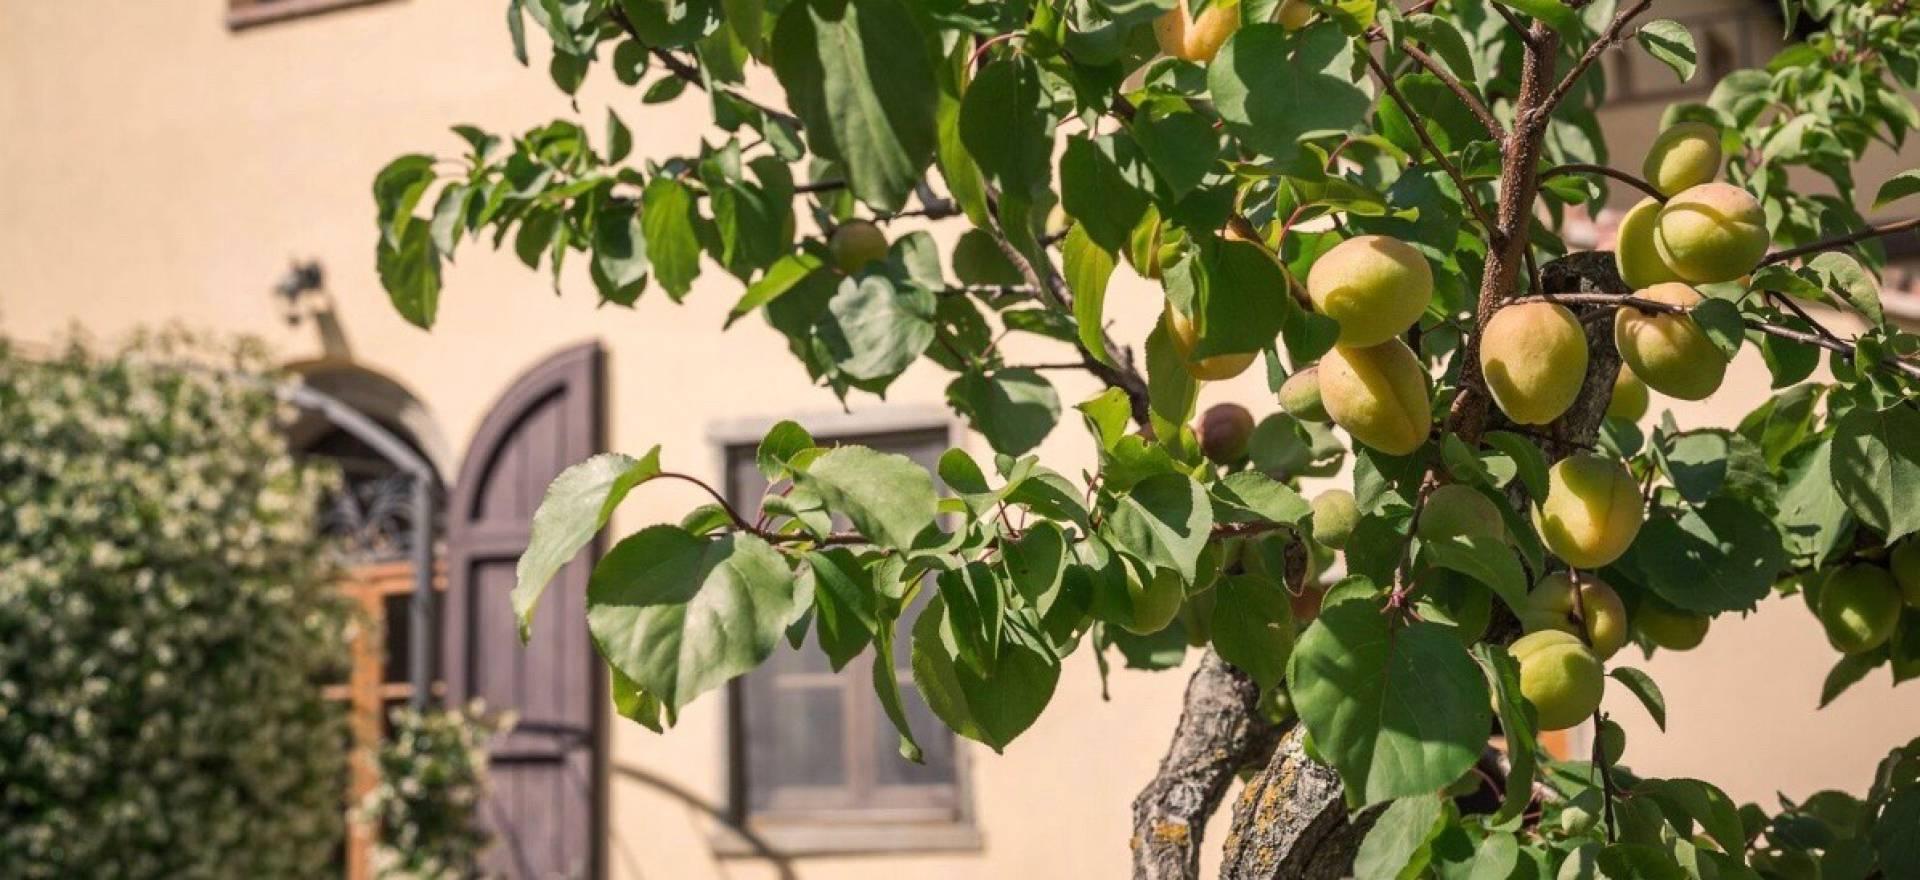 Knusse agriturismo in de chiantistreek bij Florence